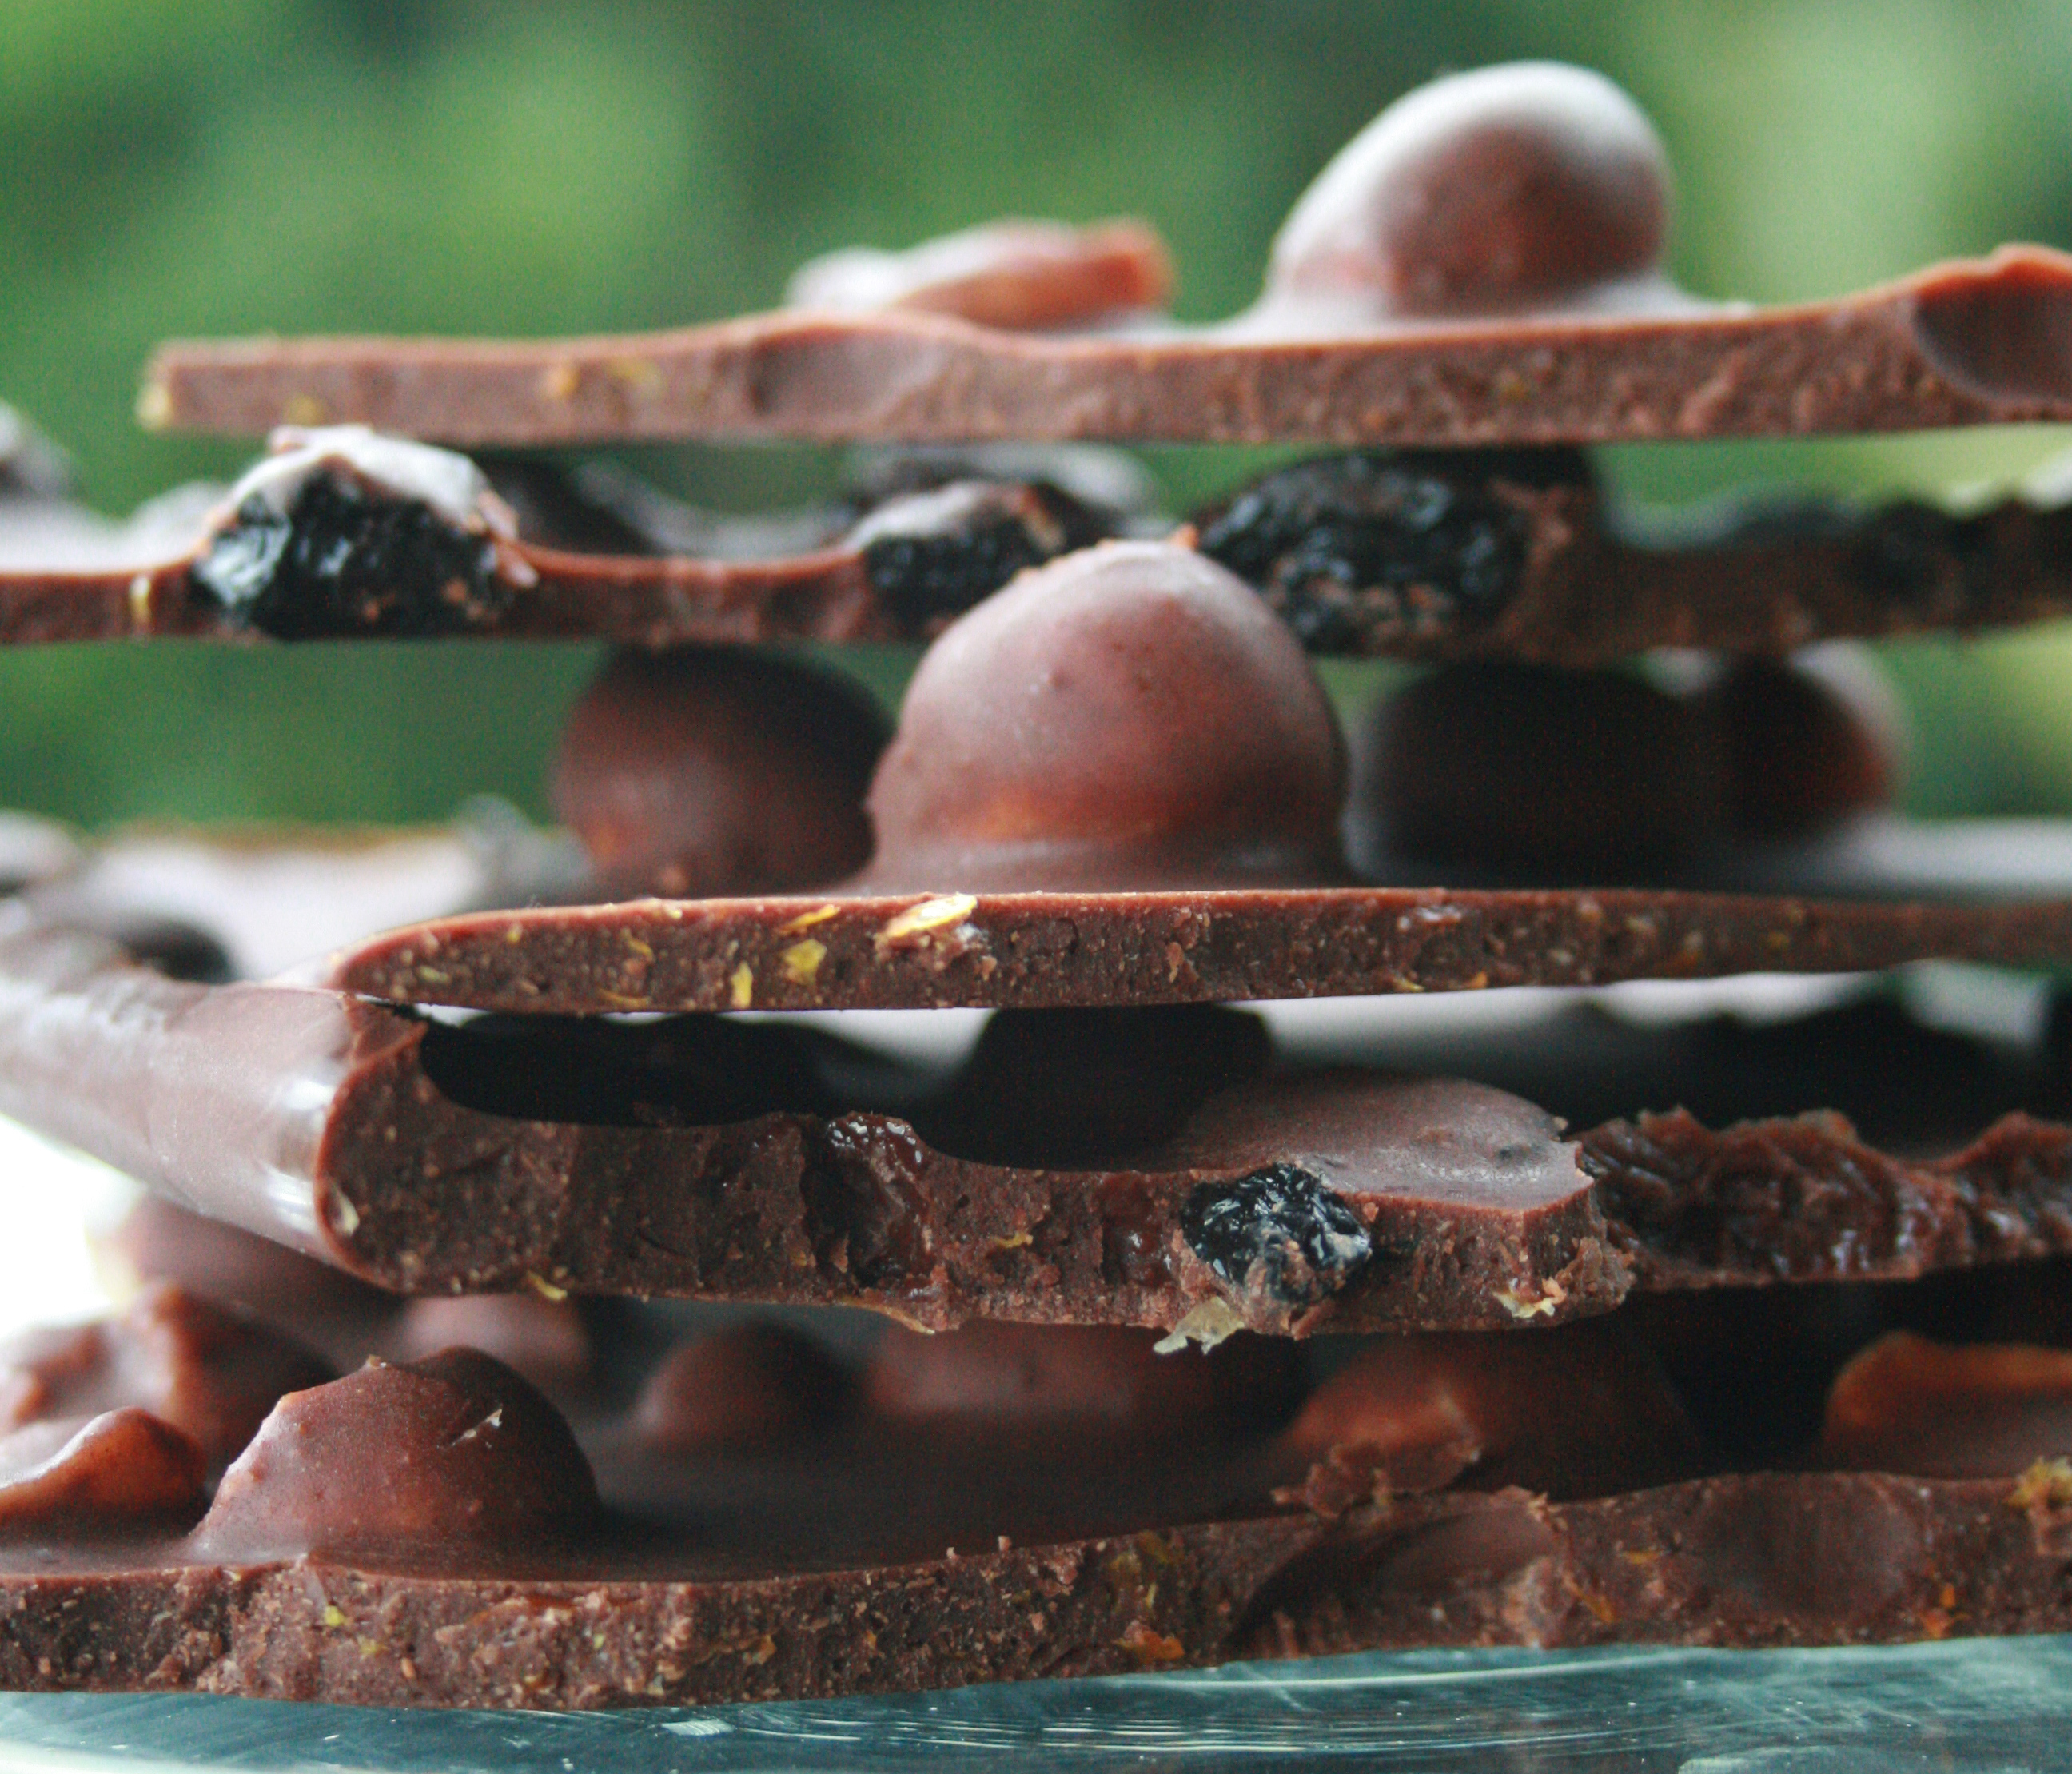 Model Abigail O'Neill recipe: model chocolate